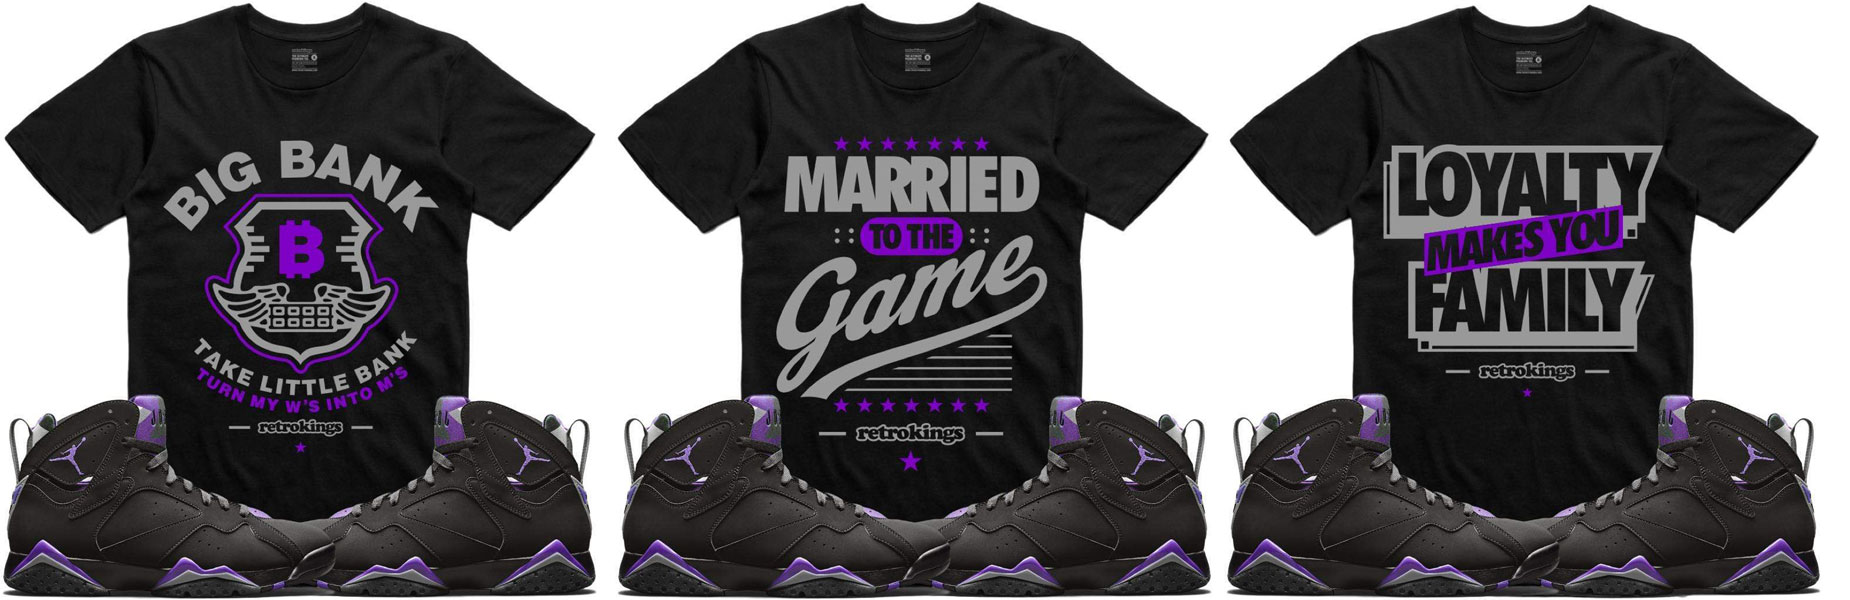 air-jordan-7-ray-allen-sneaker-tees-shirts